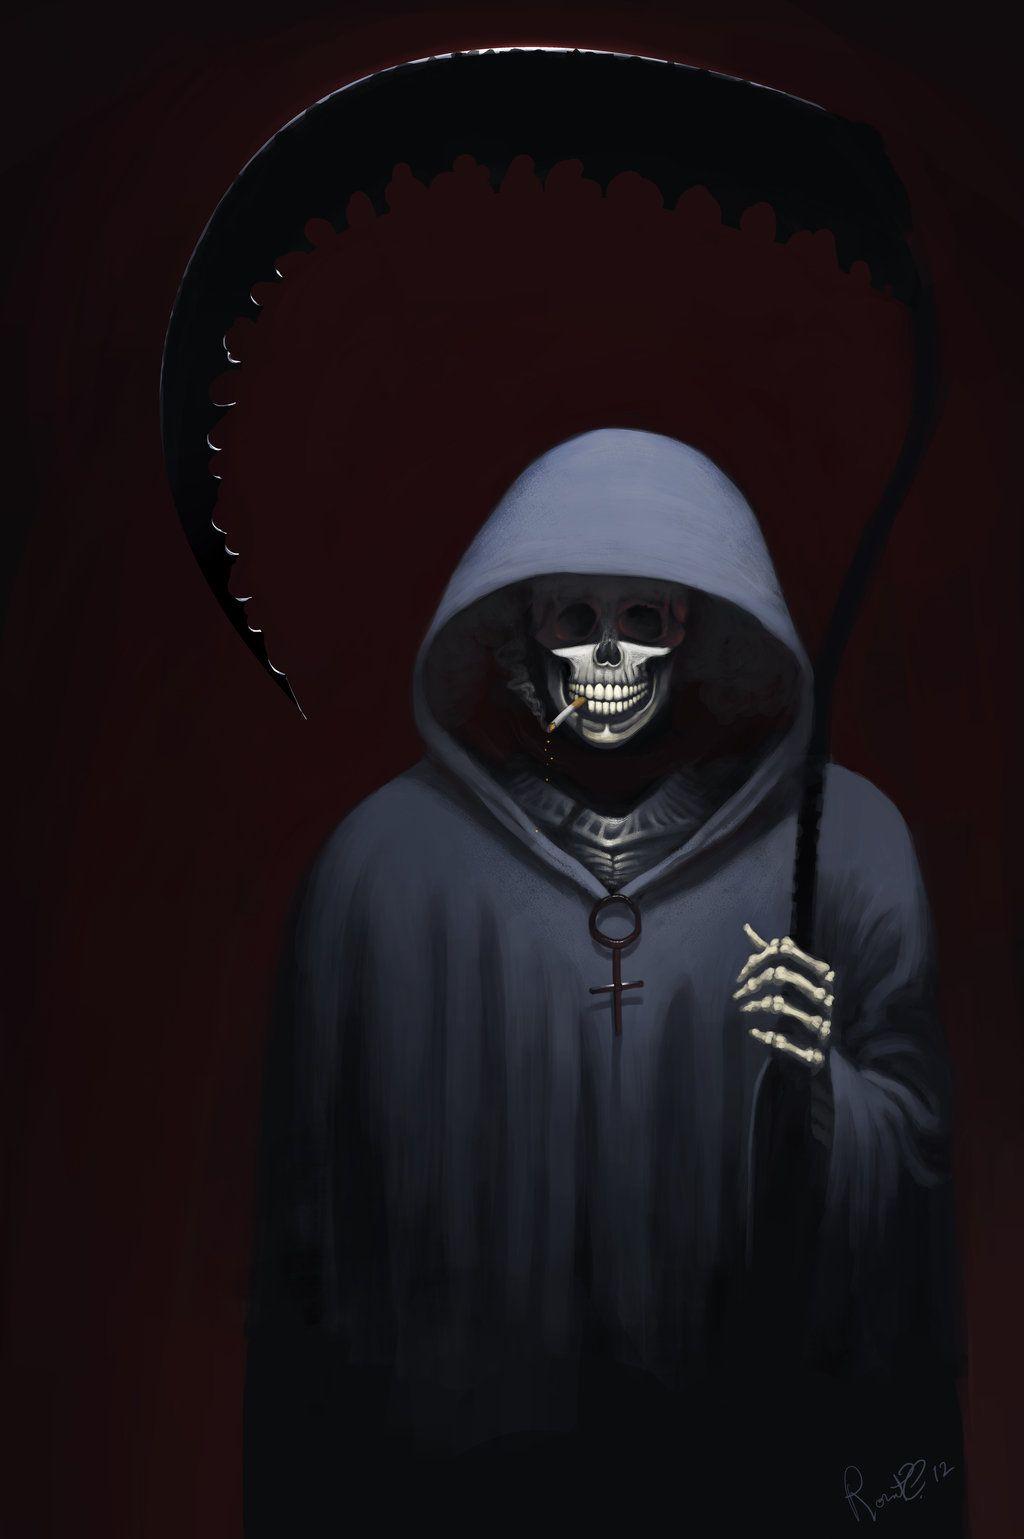 Reaper of Souls by RobertCopu.deviantart.com on @deviantART